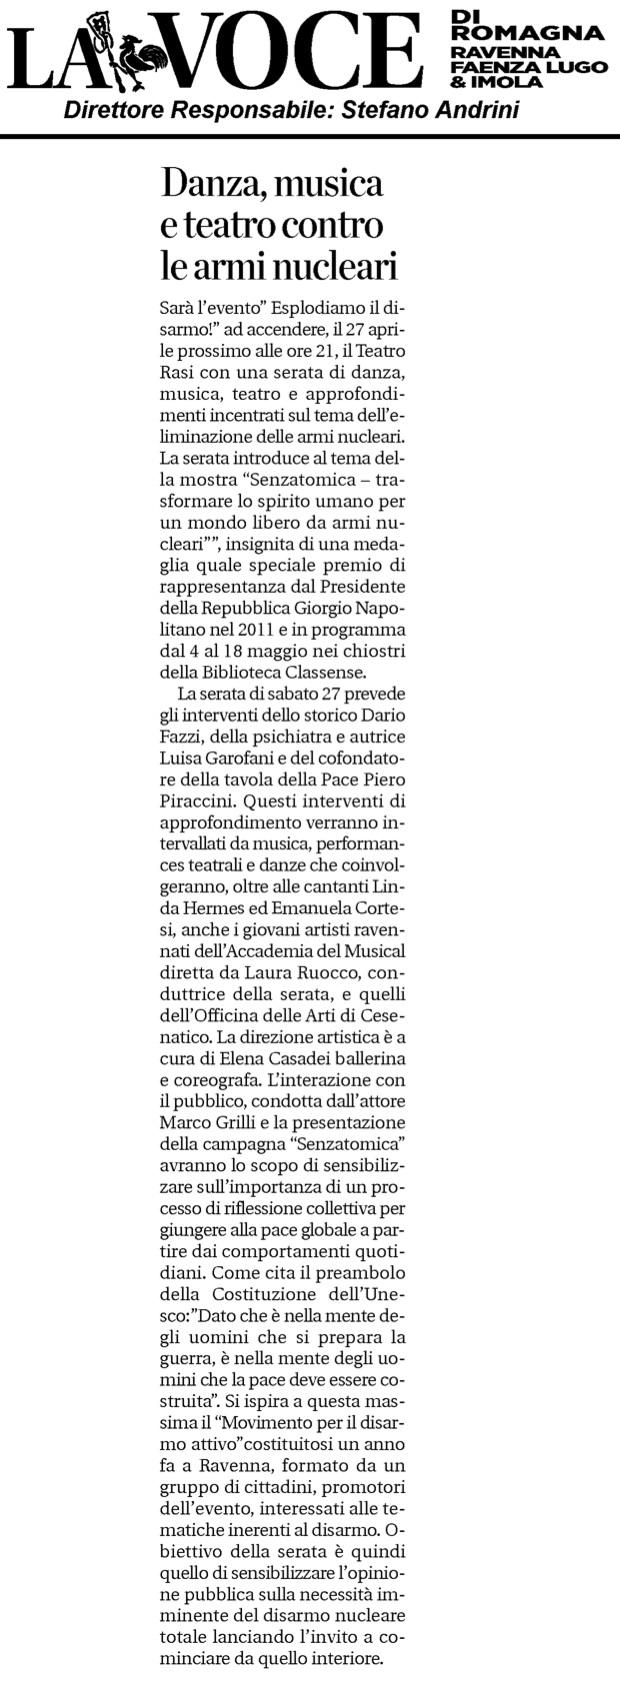 2013-04-20_LaVoceDiRomagna